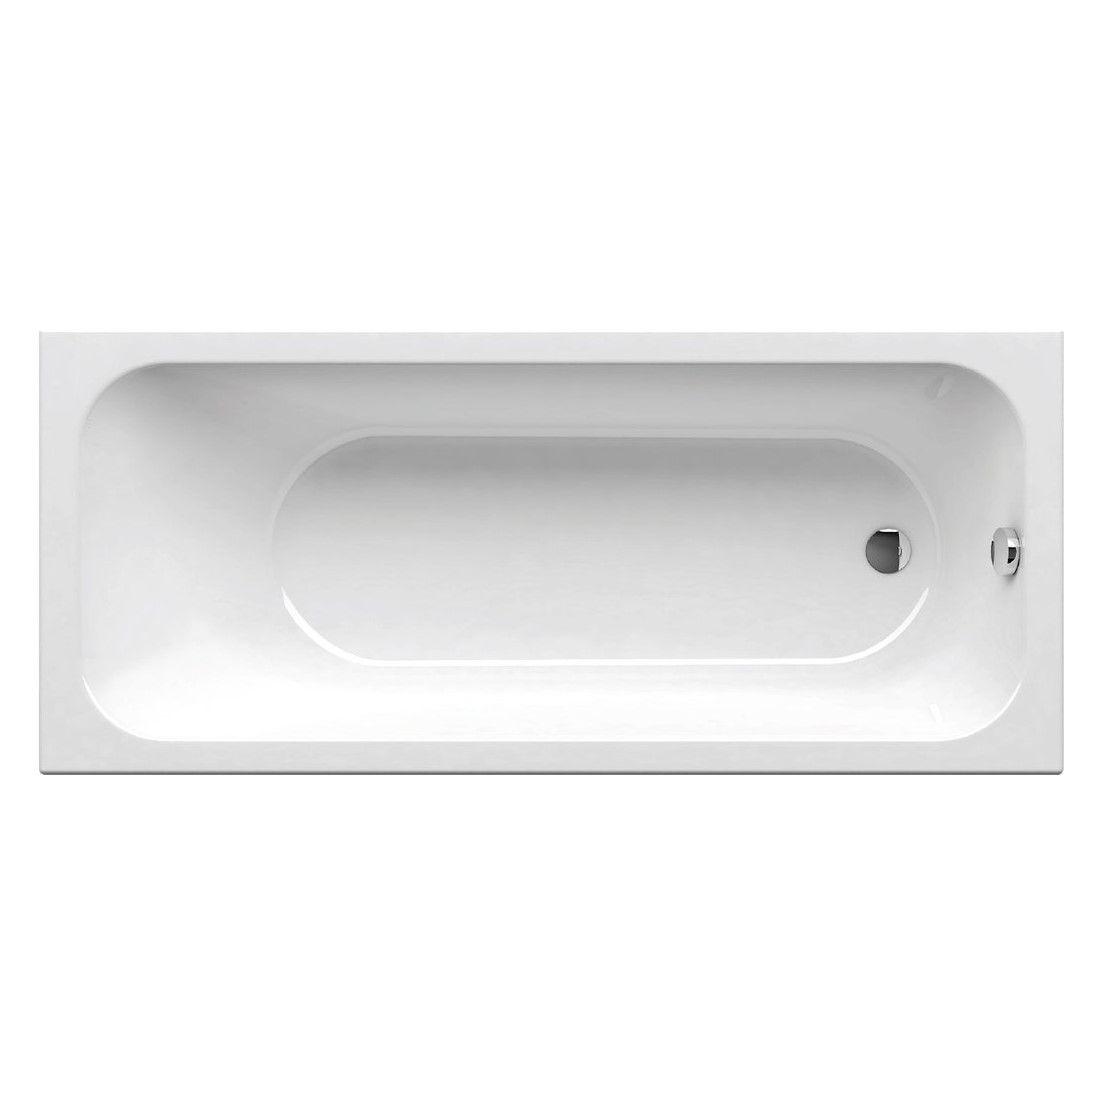 Акриловая ванна с гидромассажем Ravak Chrome 150x70 ФОТО